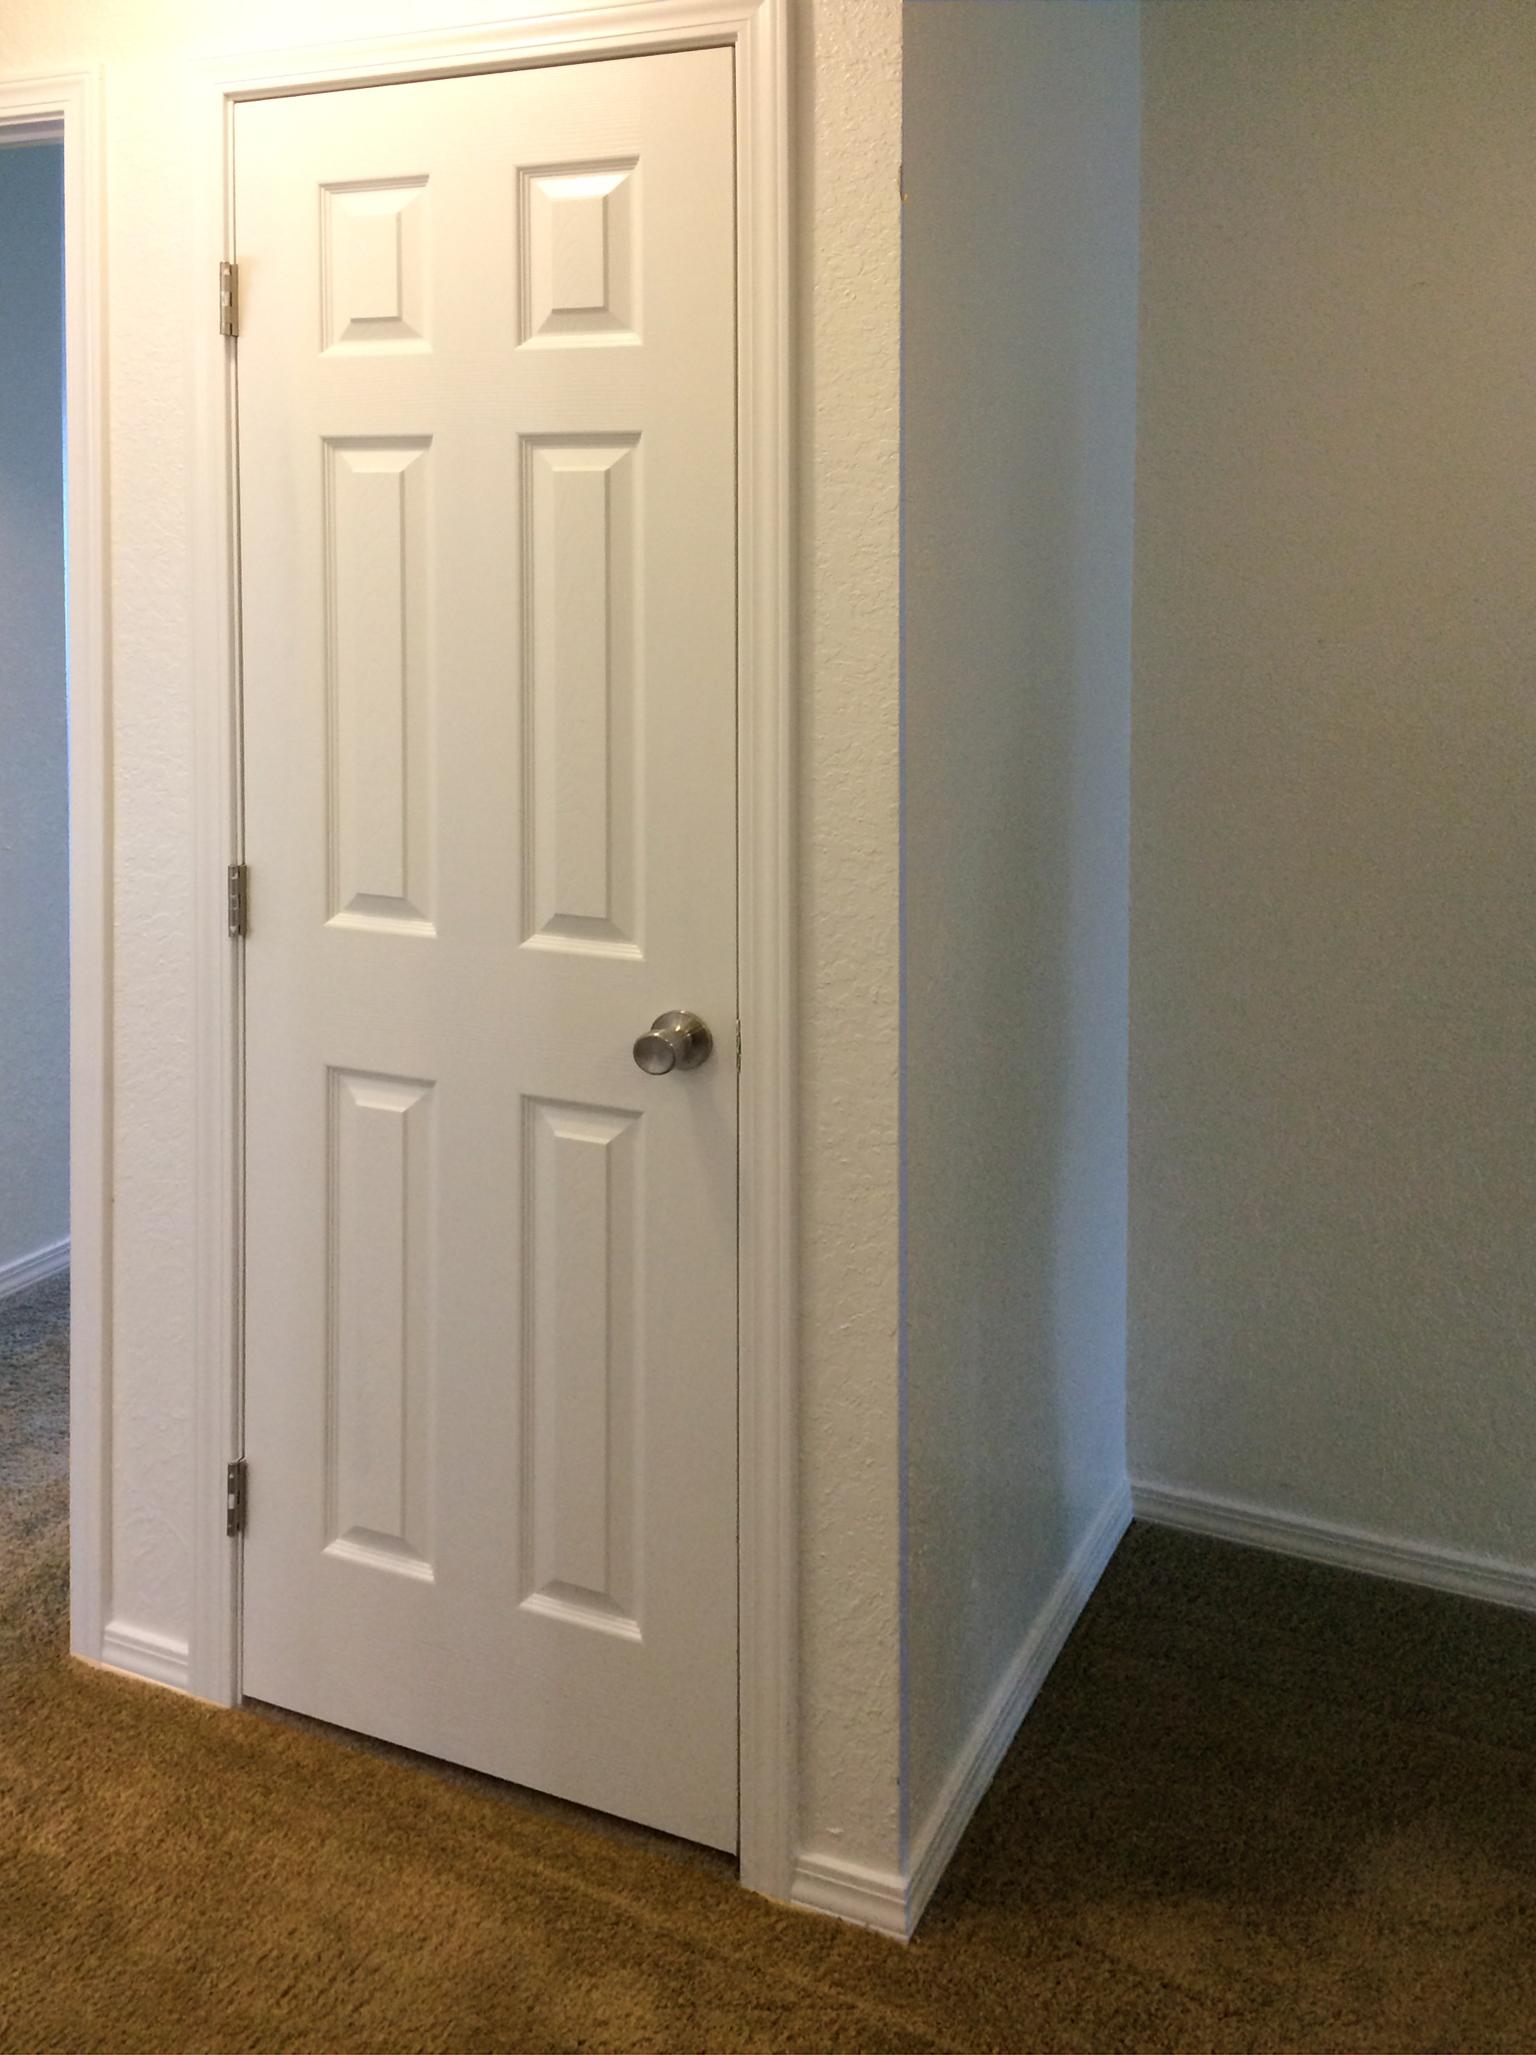 Hall closet for extra storage space.